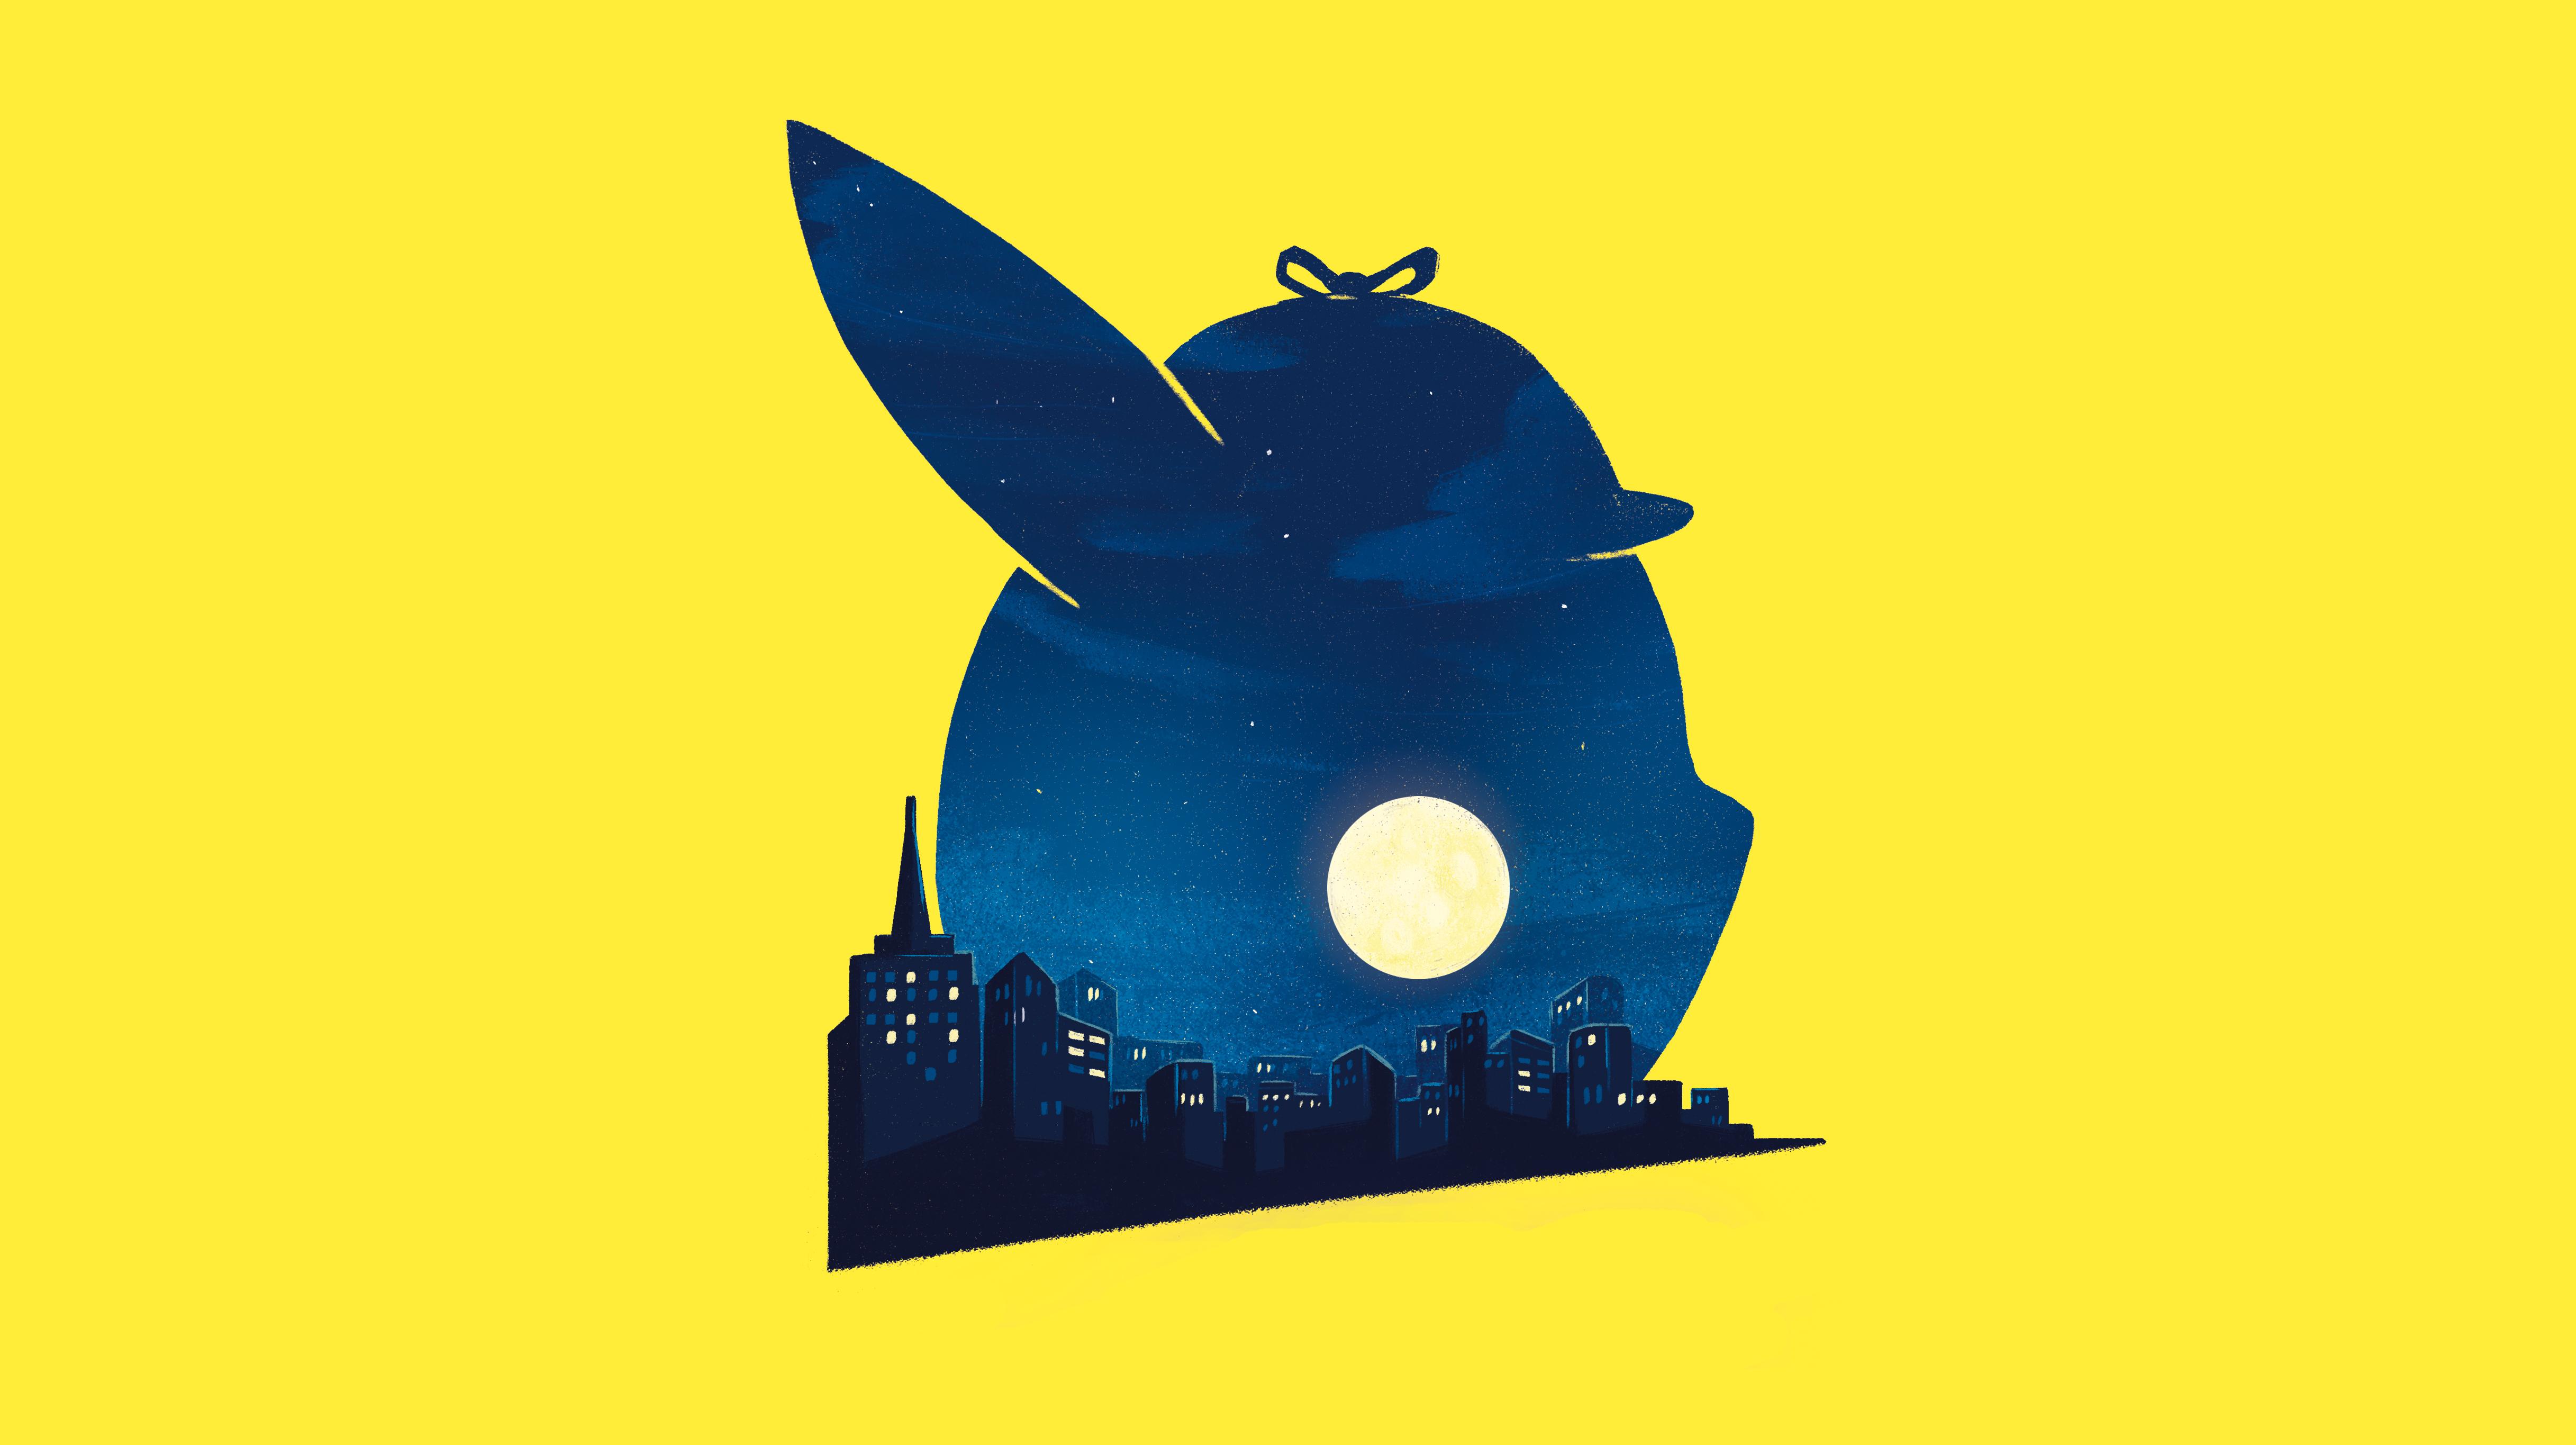 1366x768 Pokemon Detective Pikachu Movie Minimalist Poster